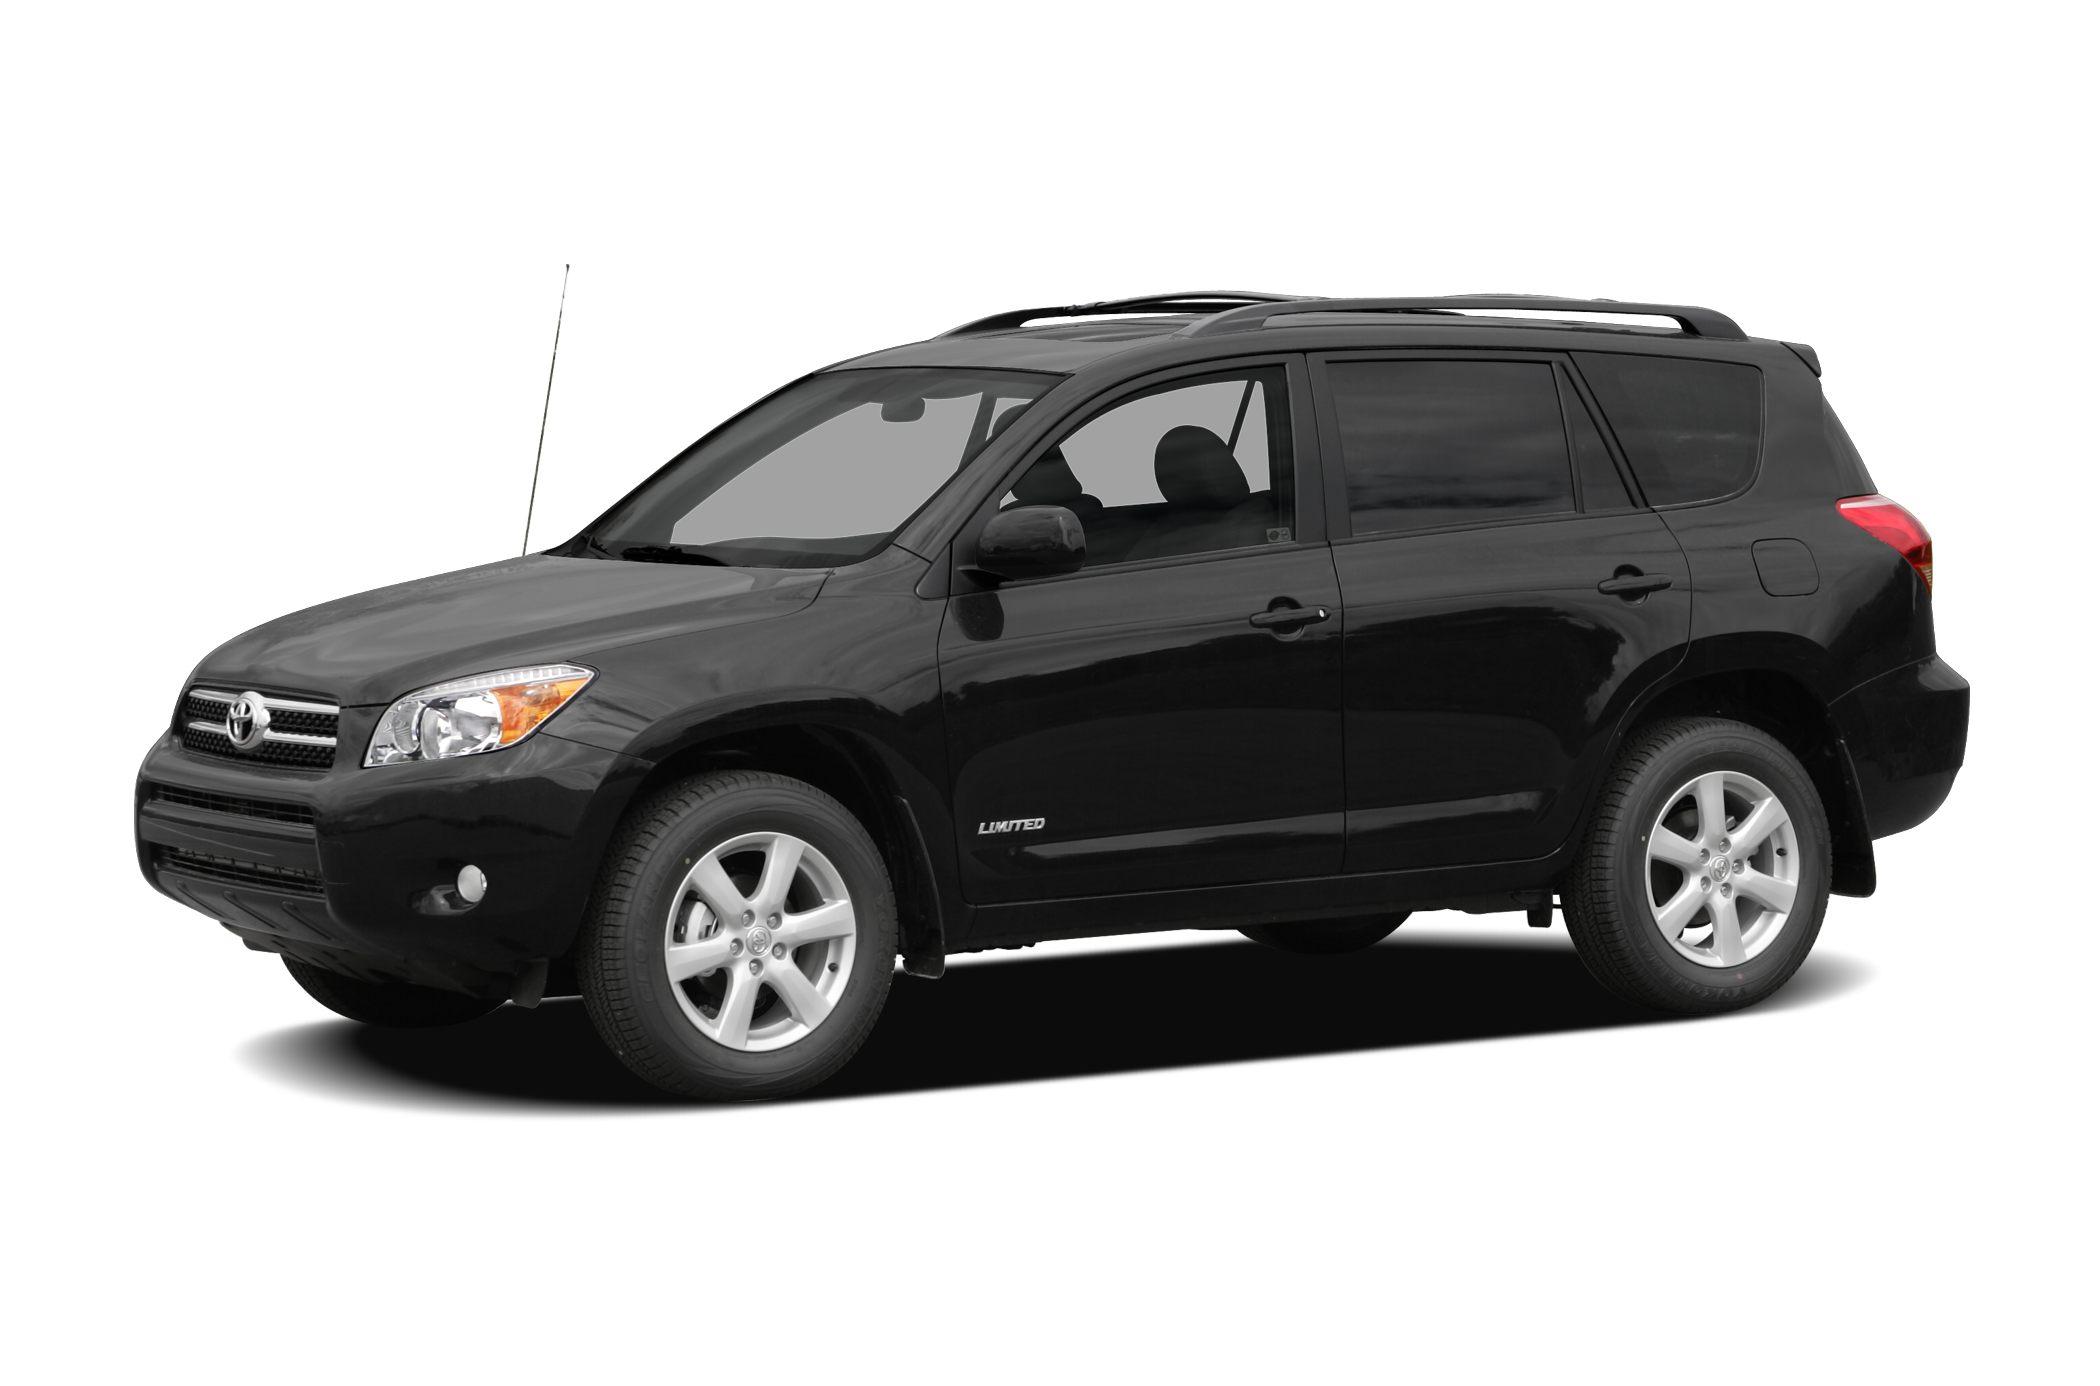 2008 Toyota Rav4 Pricing And Specs